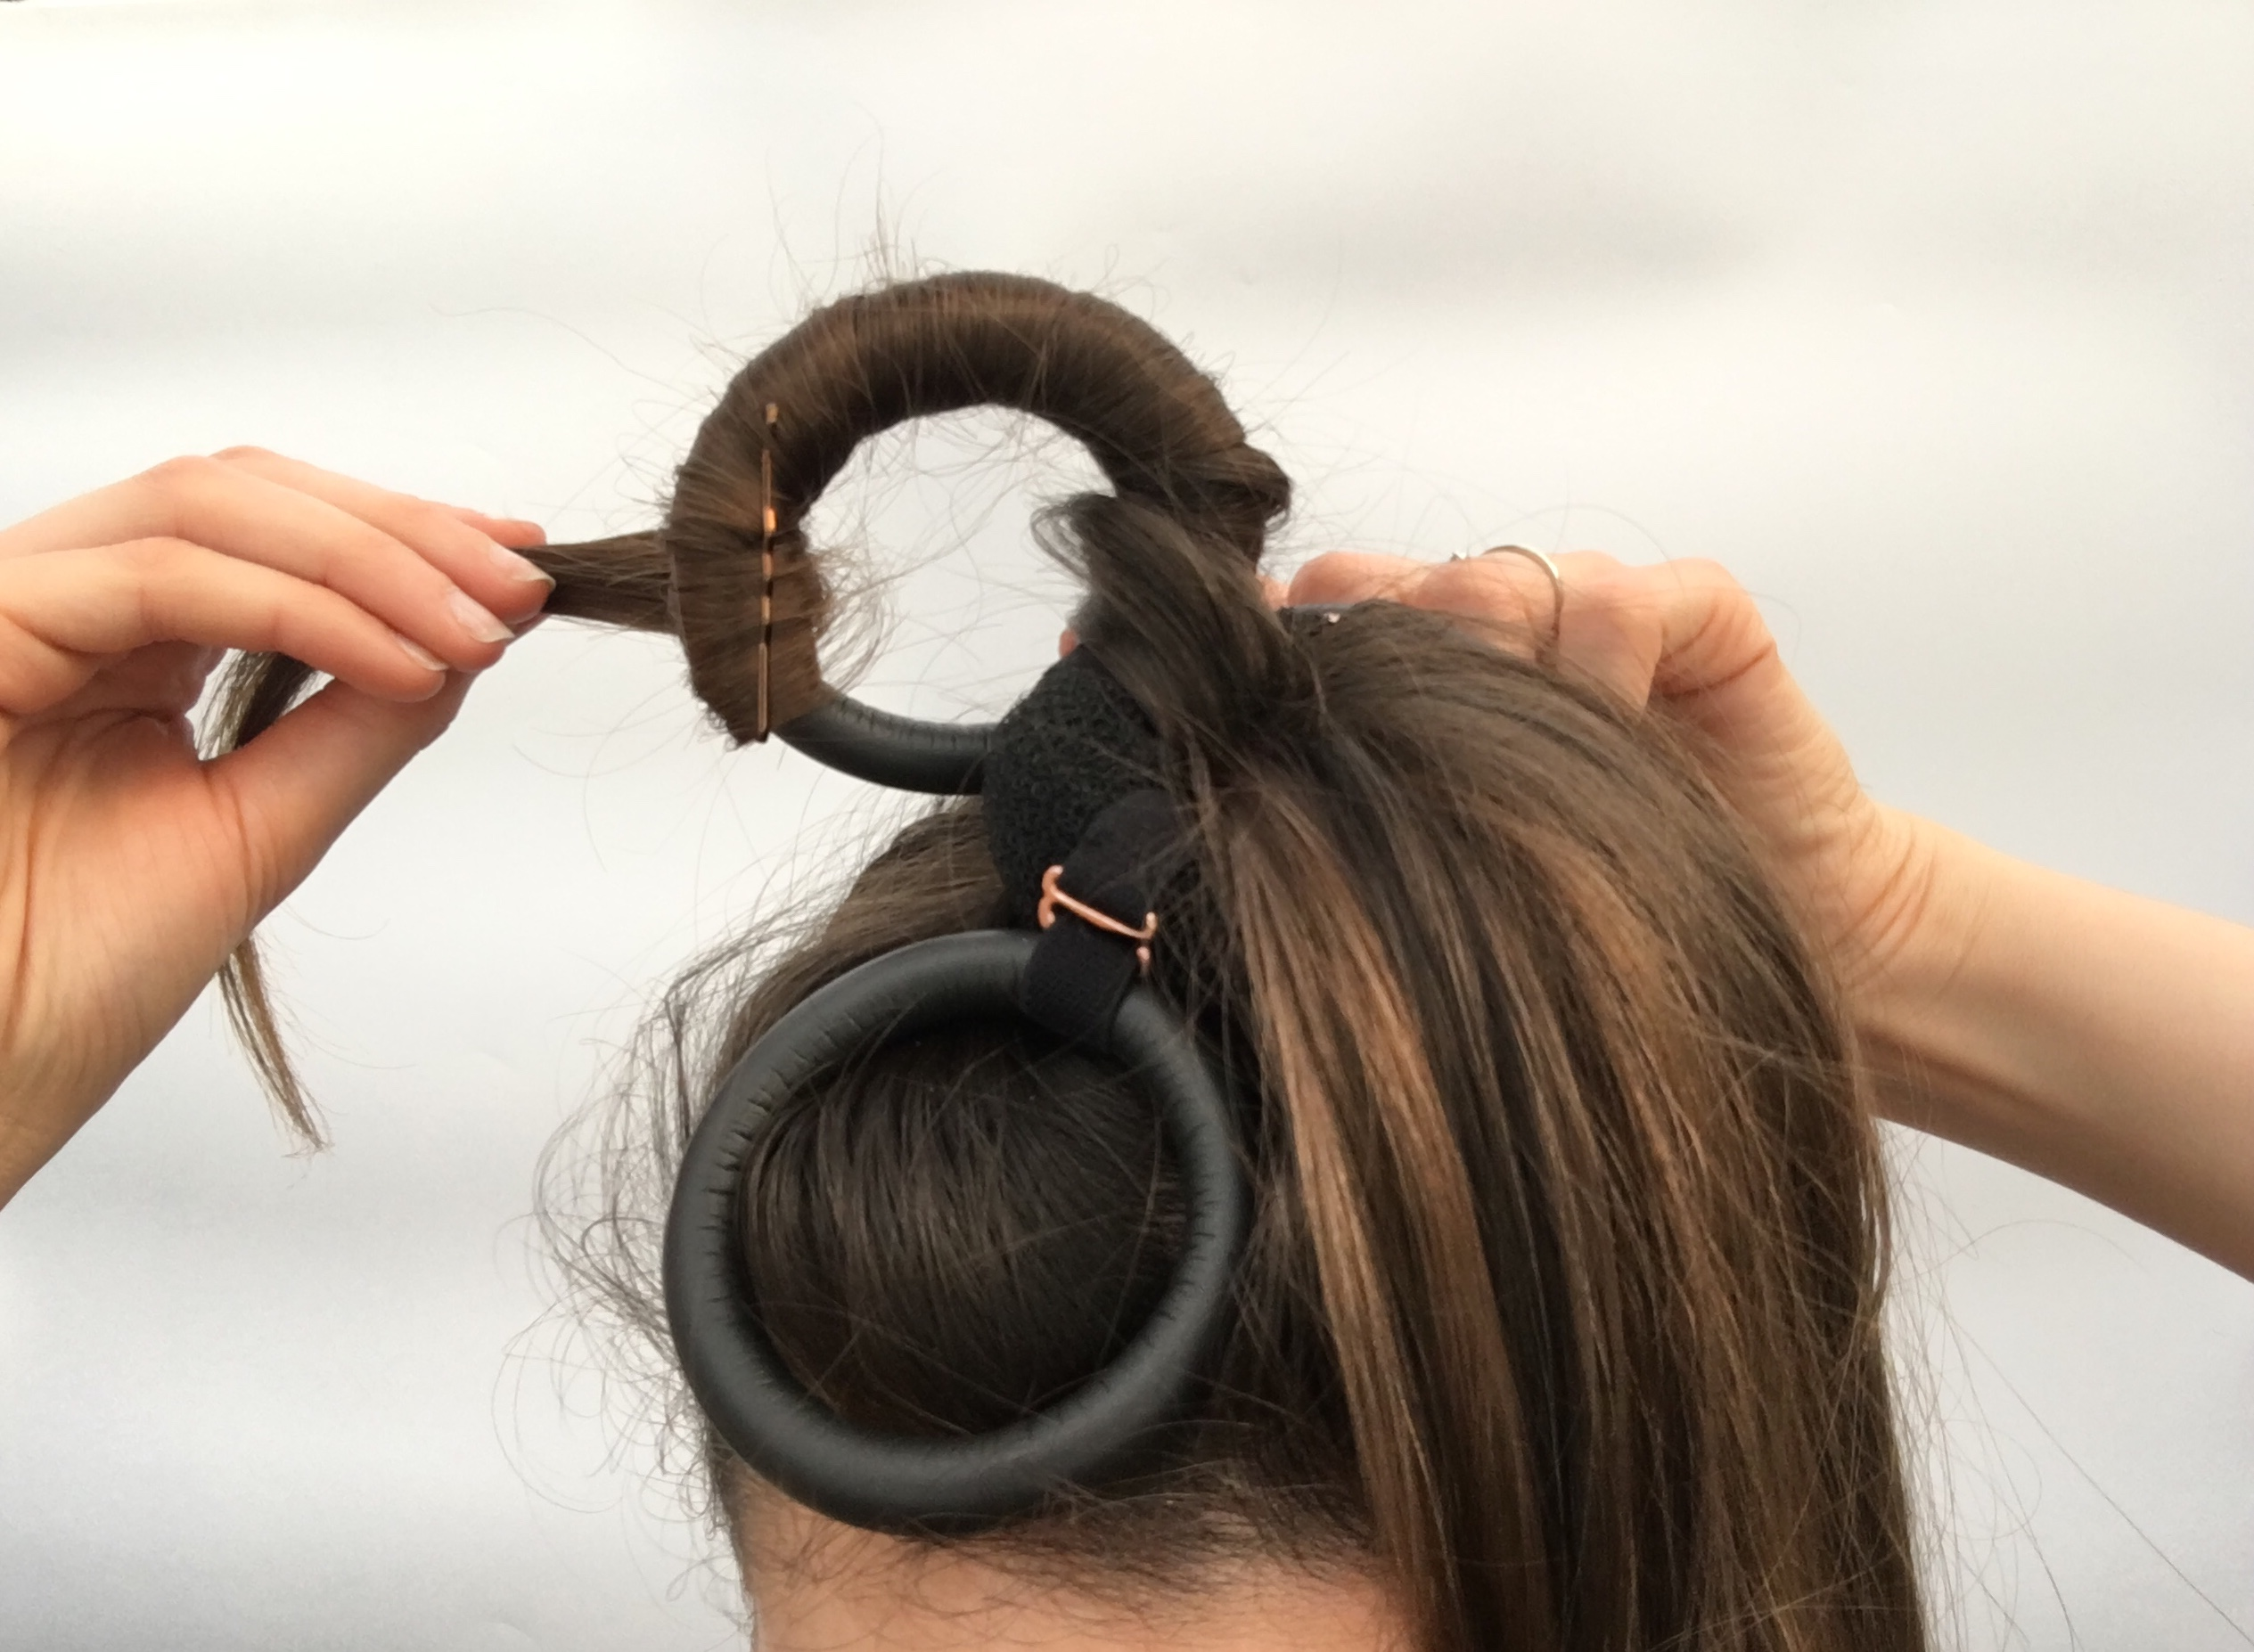 flower curl hair curler